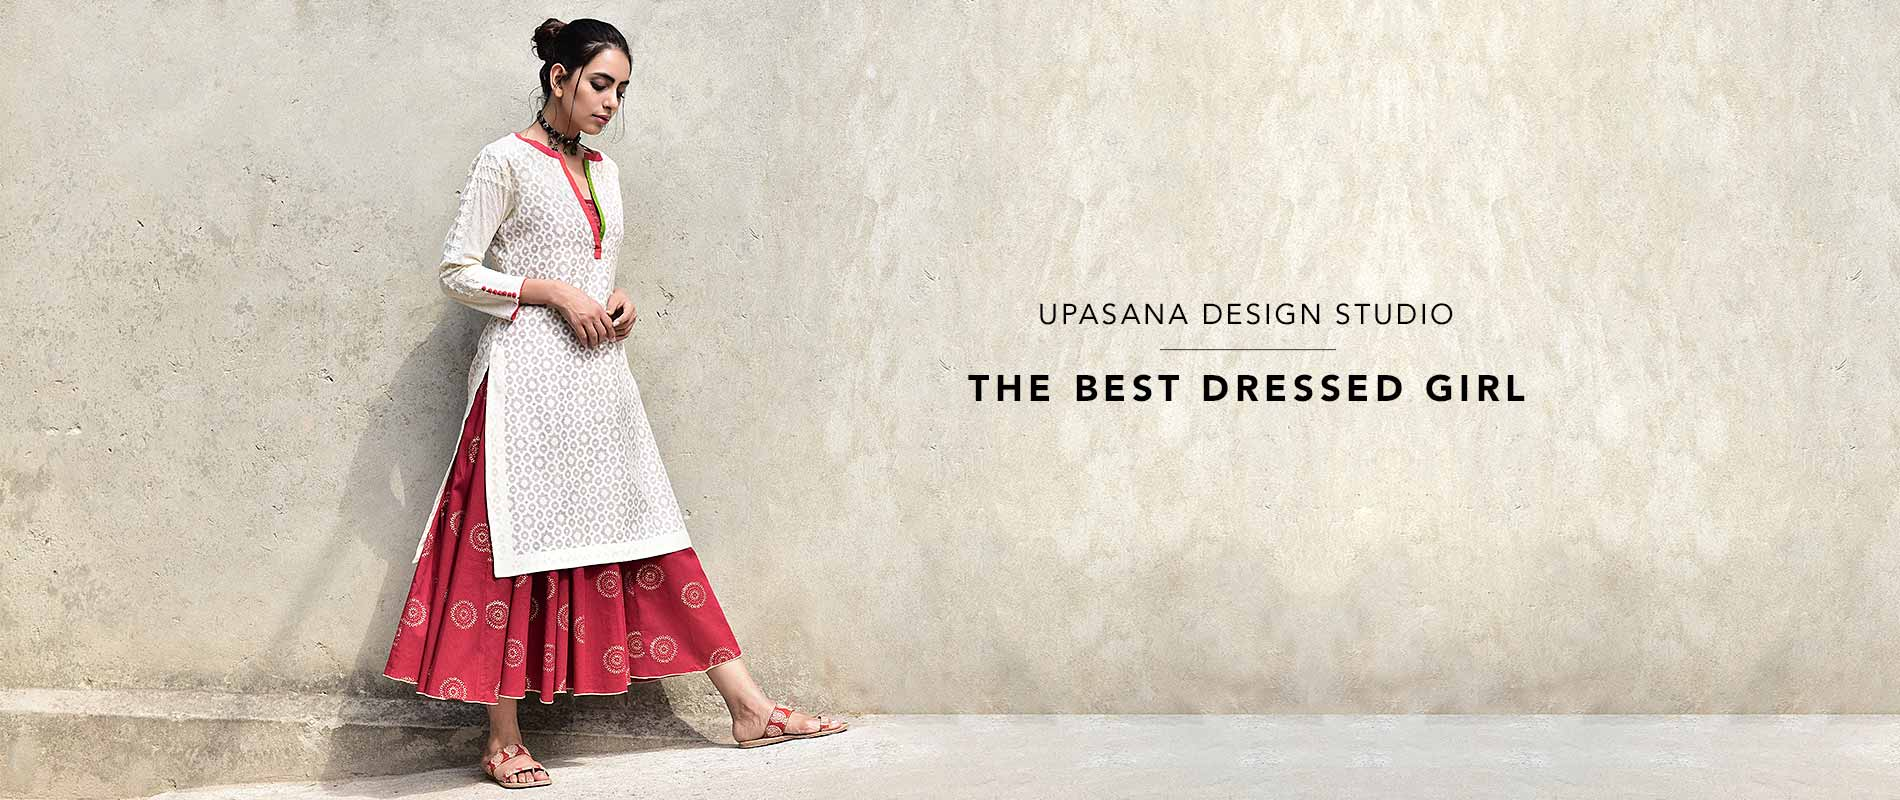 170415UPS020_UPS_Upasana_Design_Studio_6264